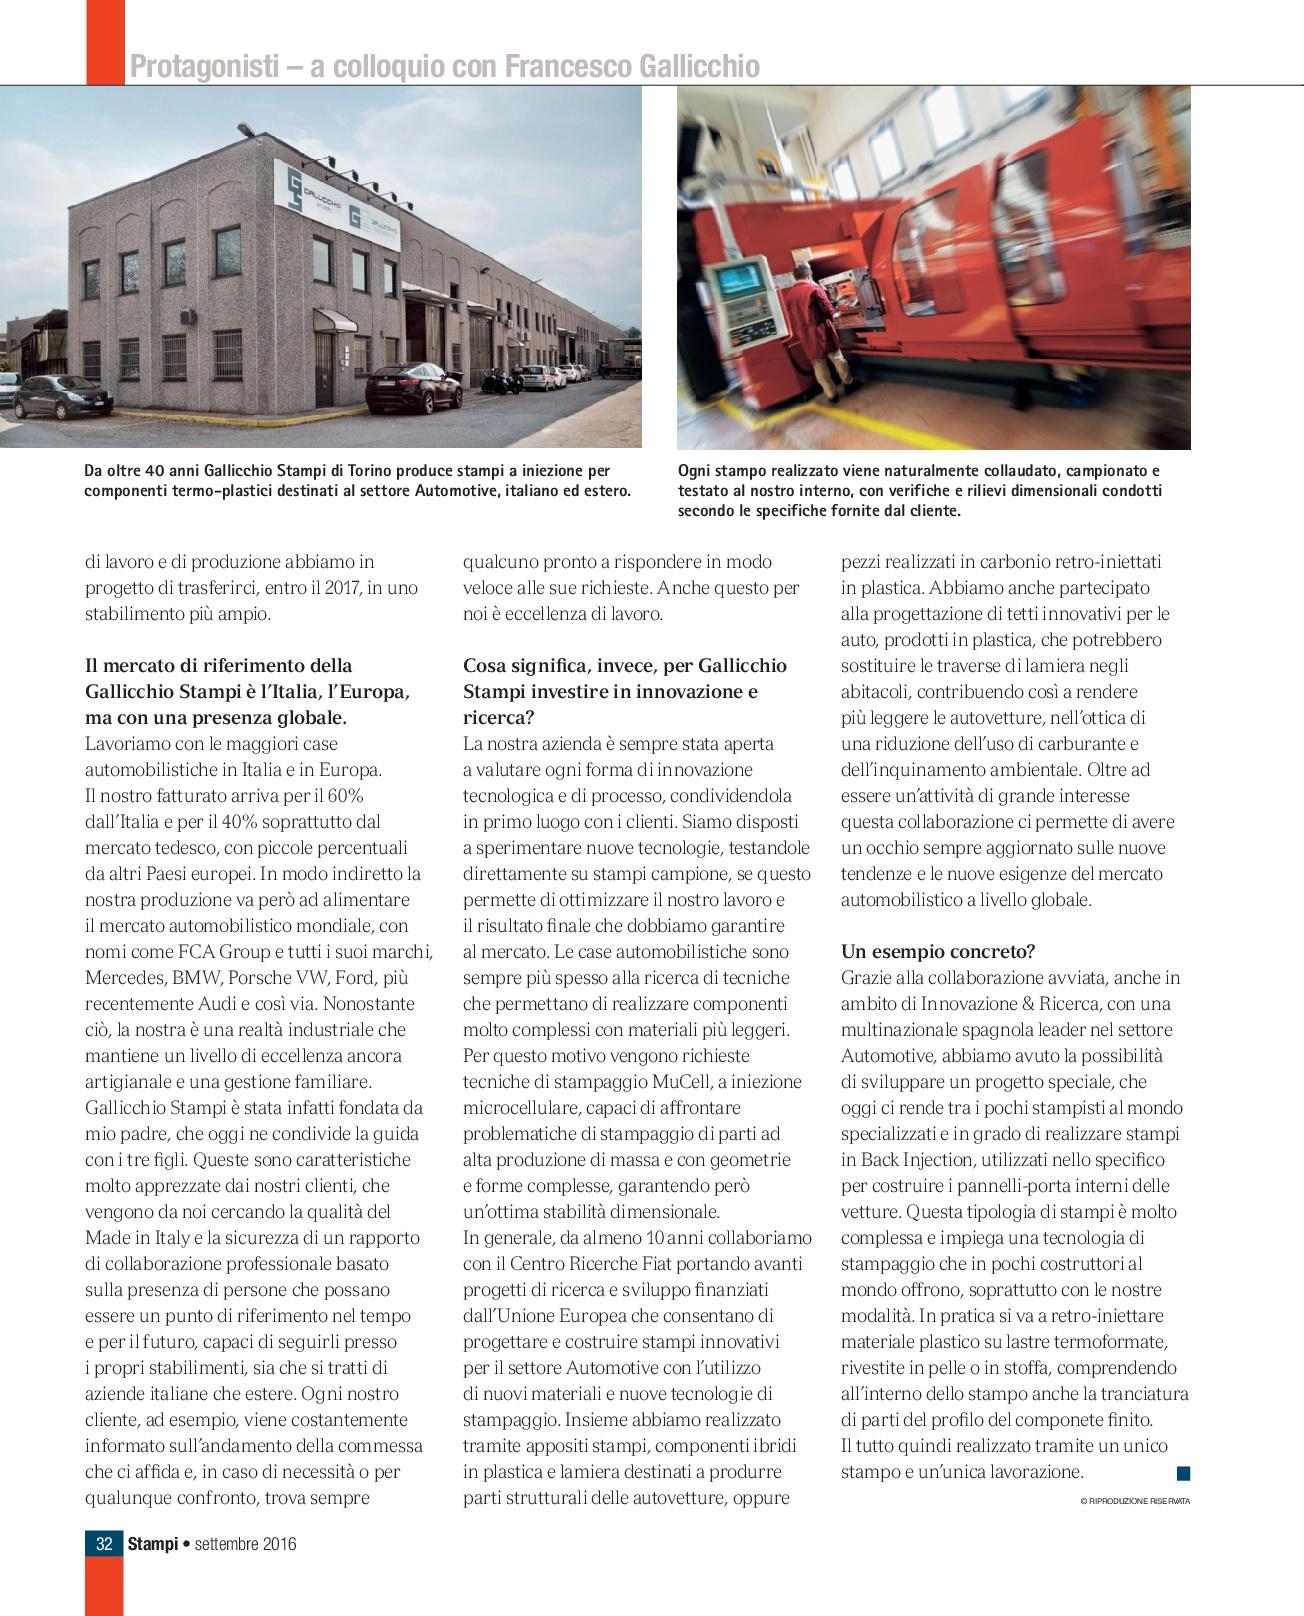 13.giornalismo_stampi_automotive_gallicchio-004